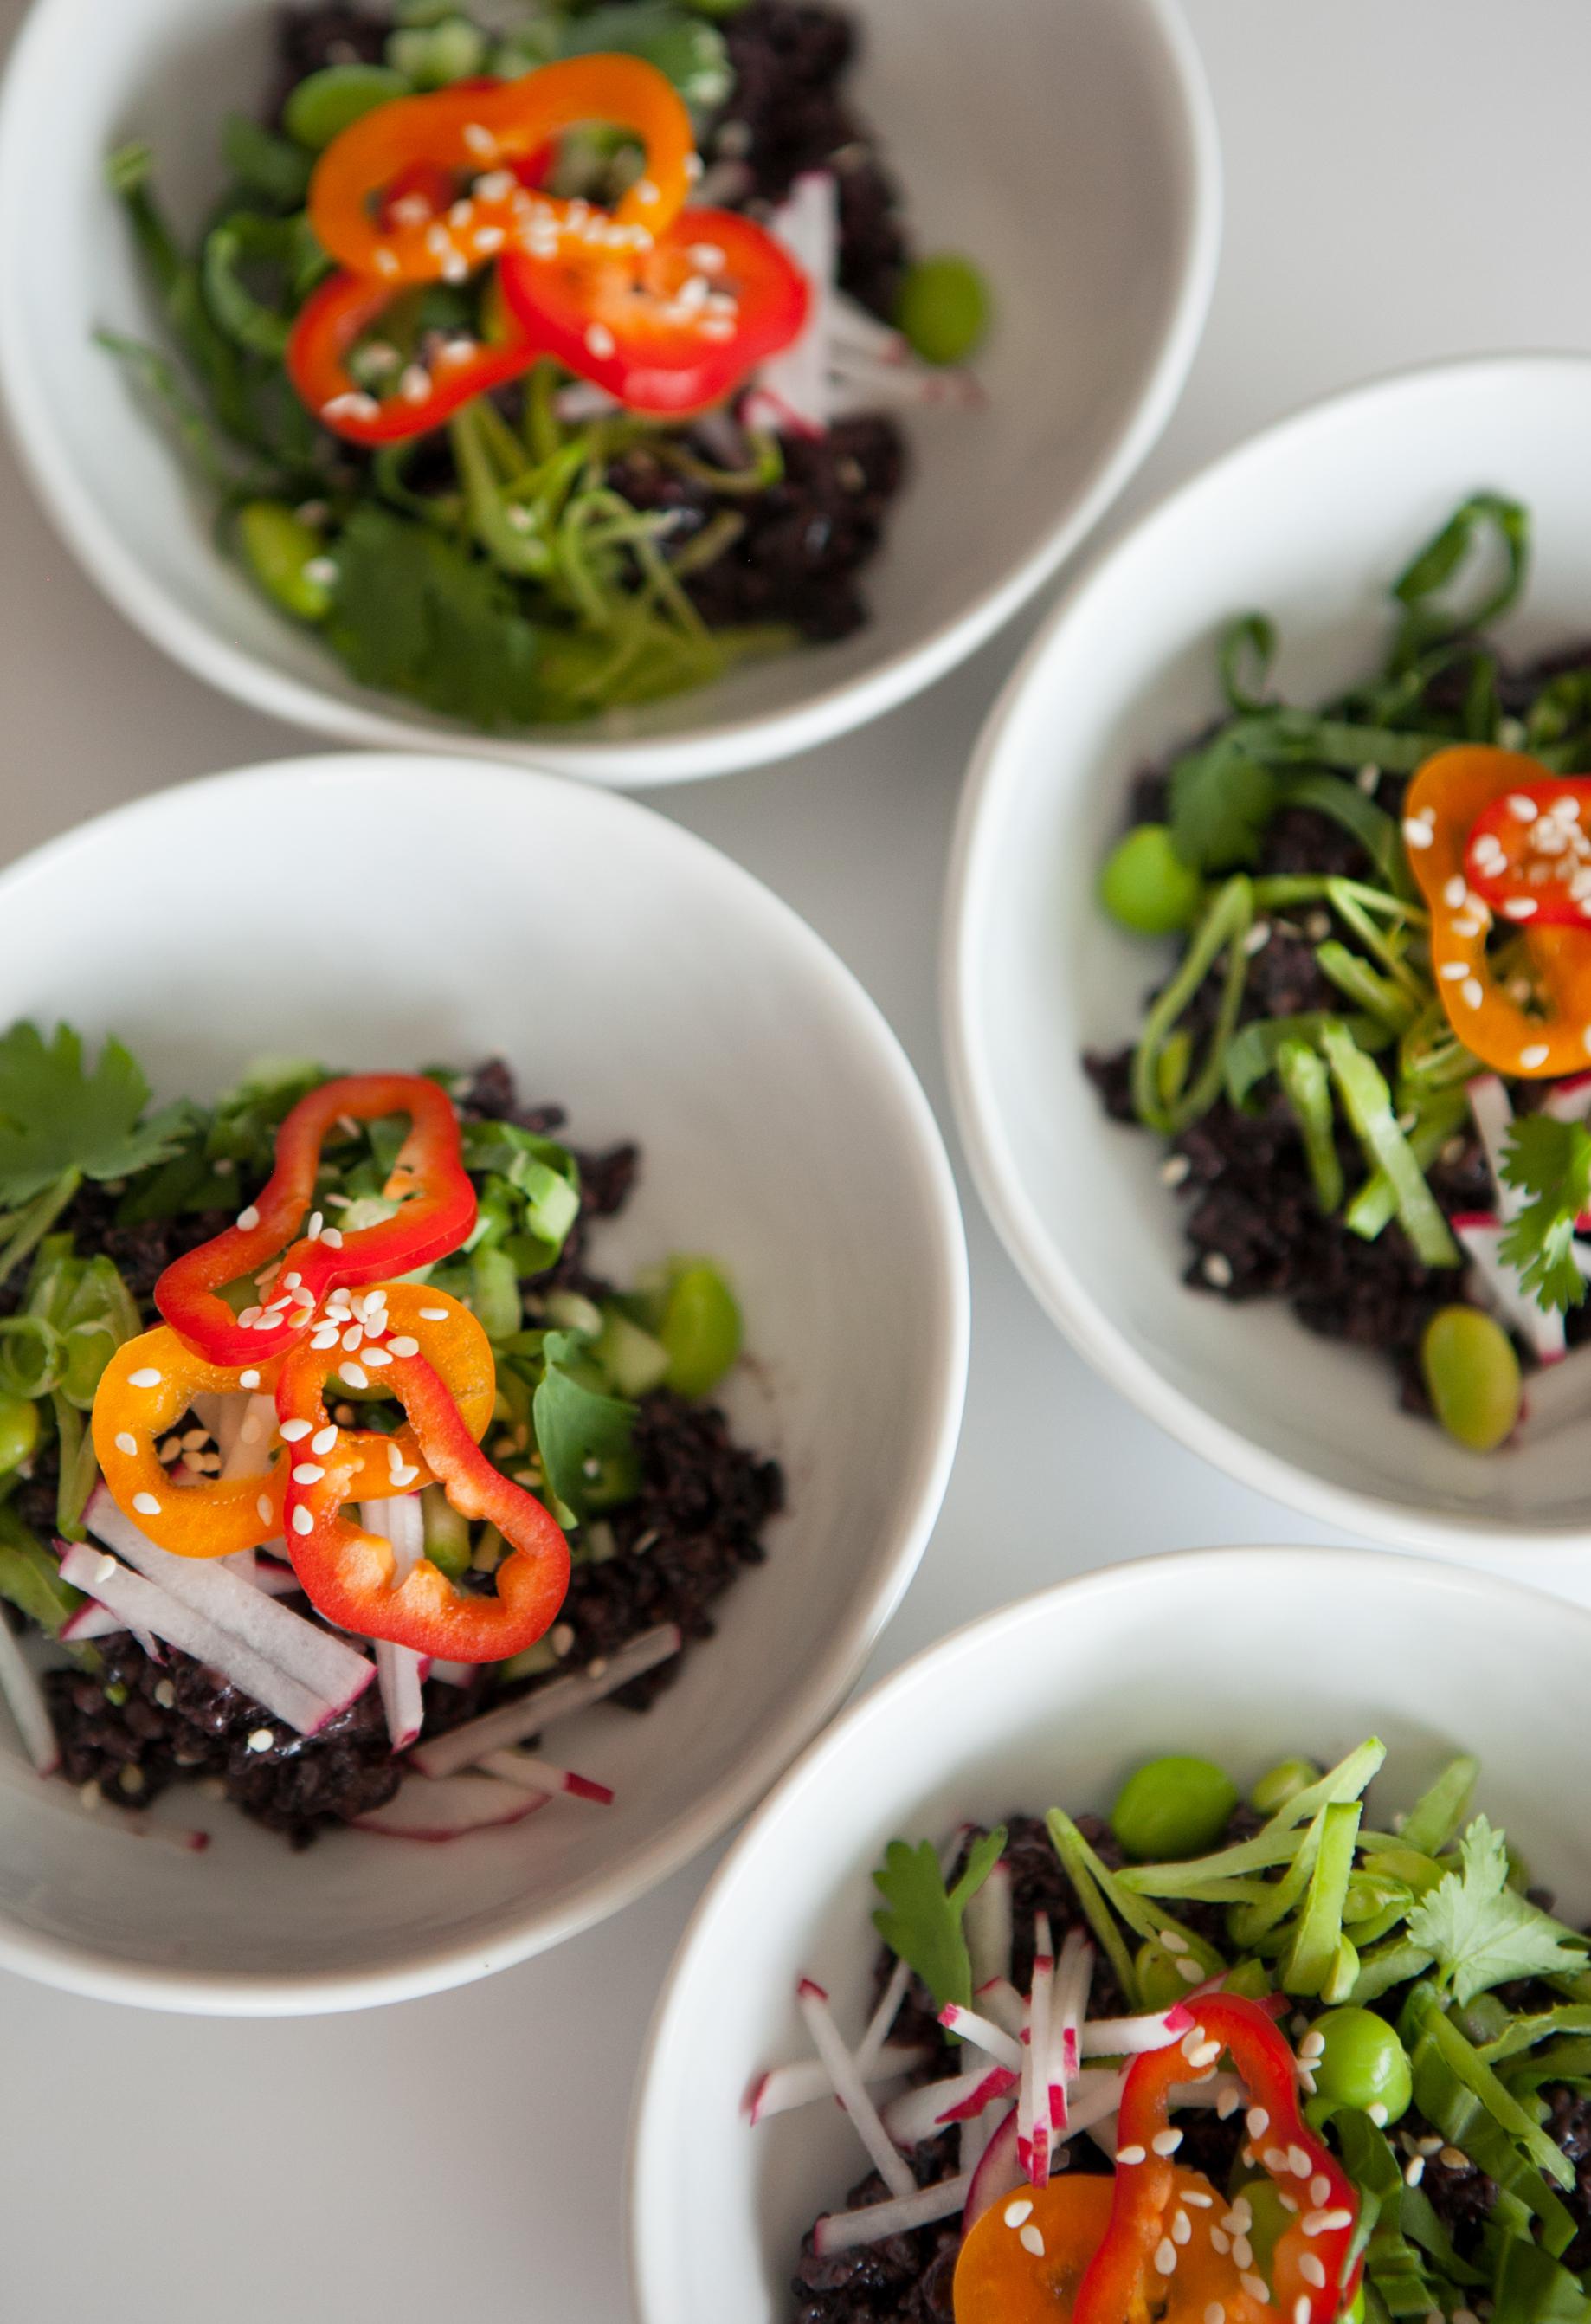 tampa-food-photographer-ablankplate-6.jpg